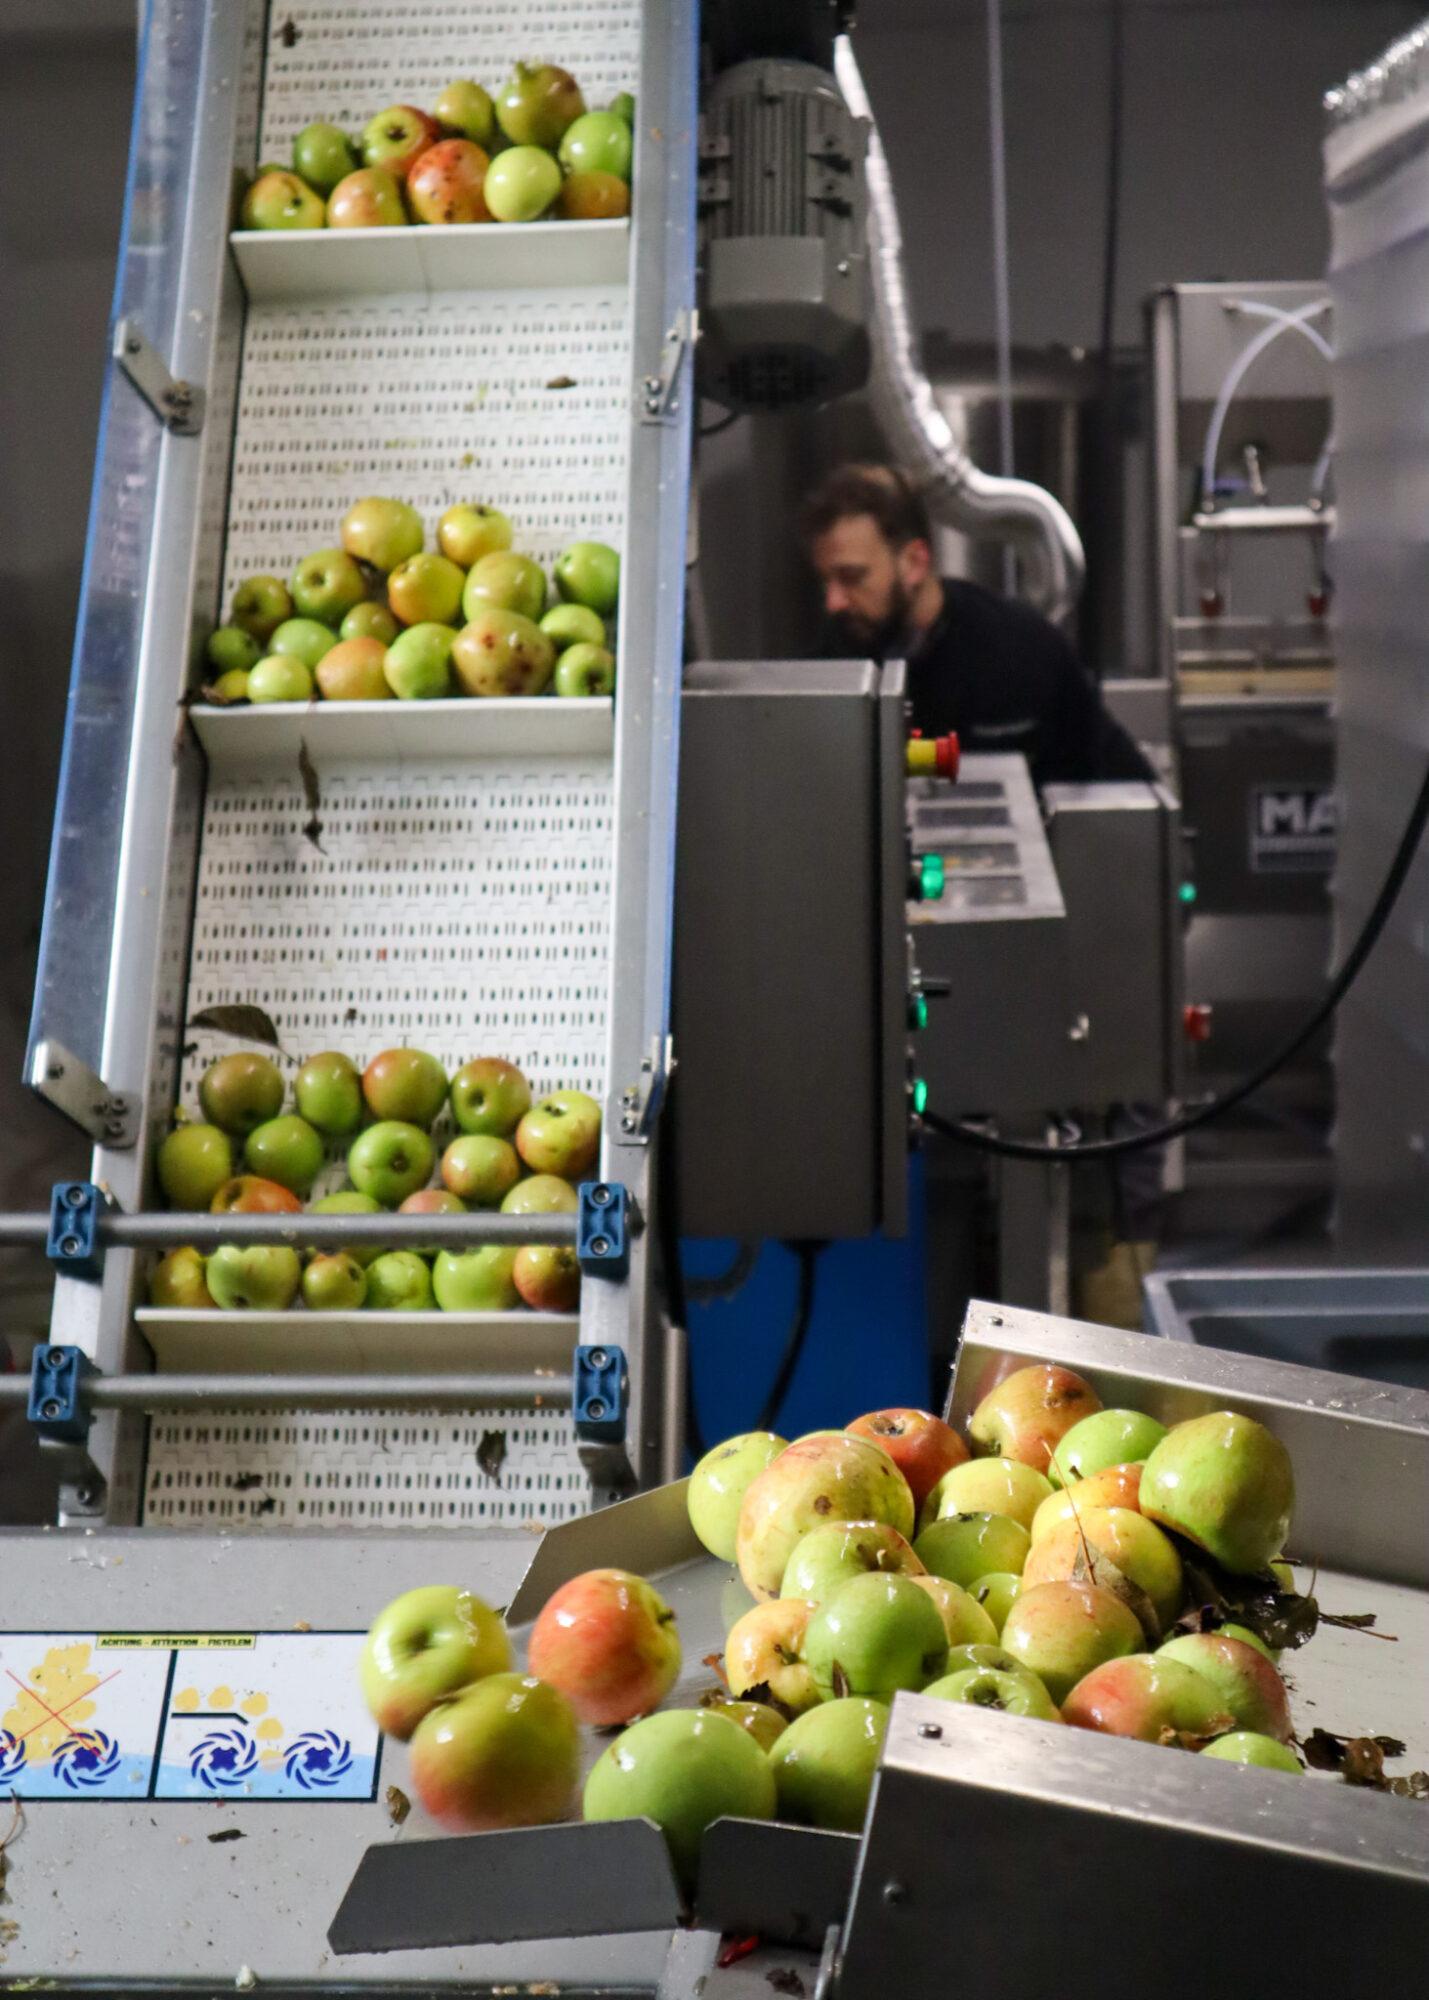 Appels persen